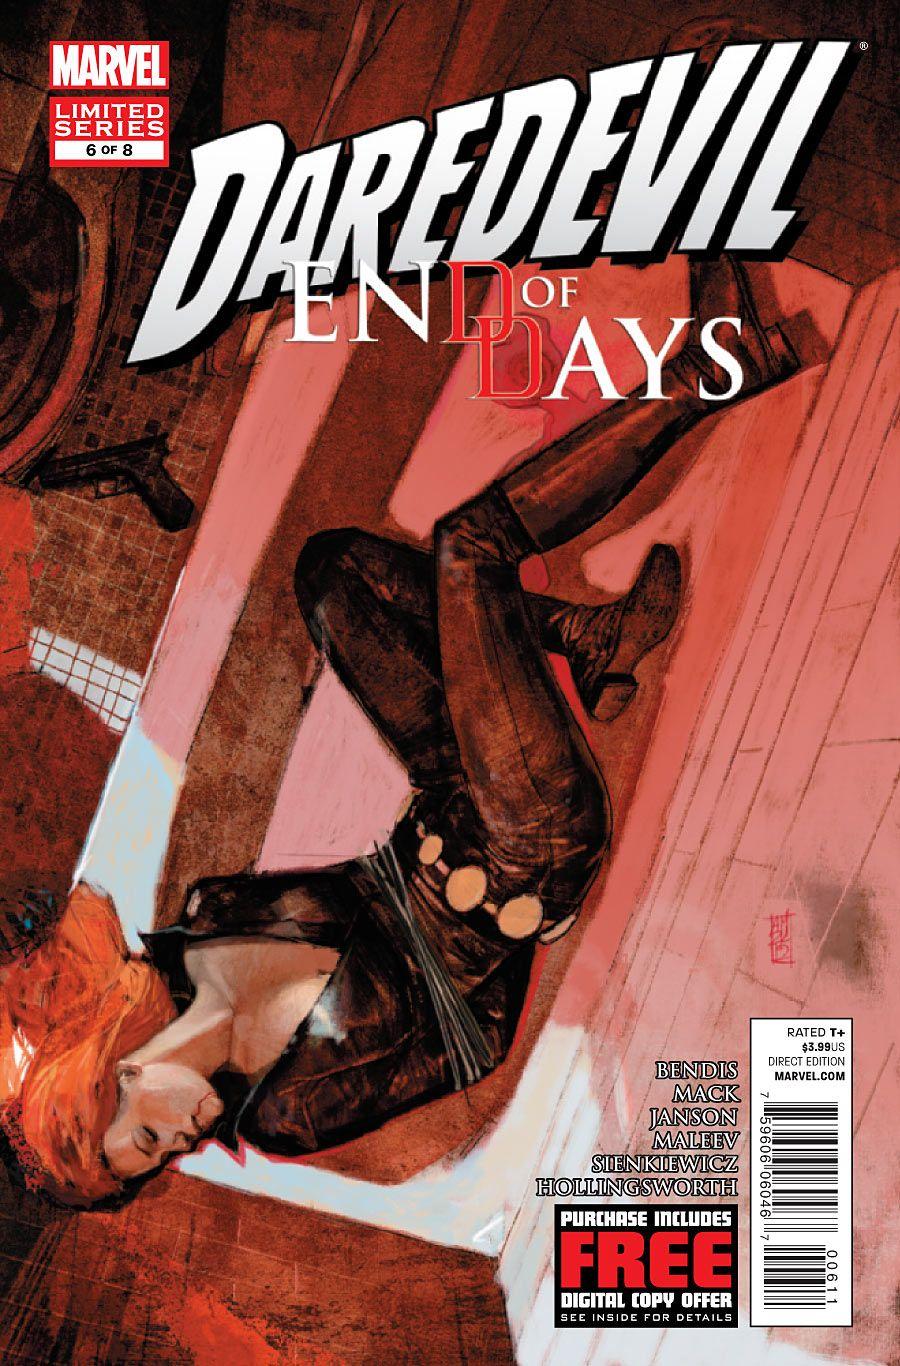 Daredevil: End of Days #6